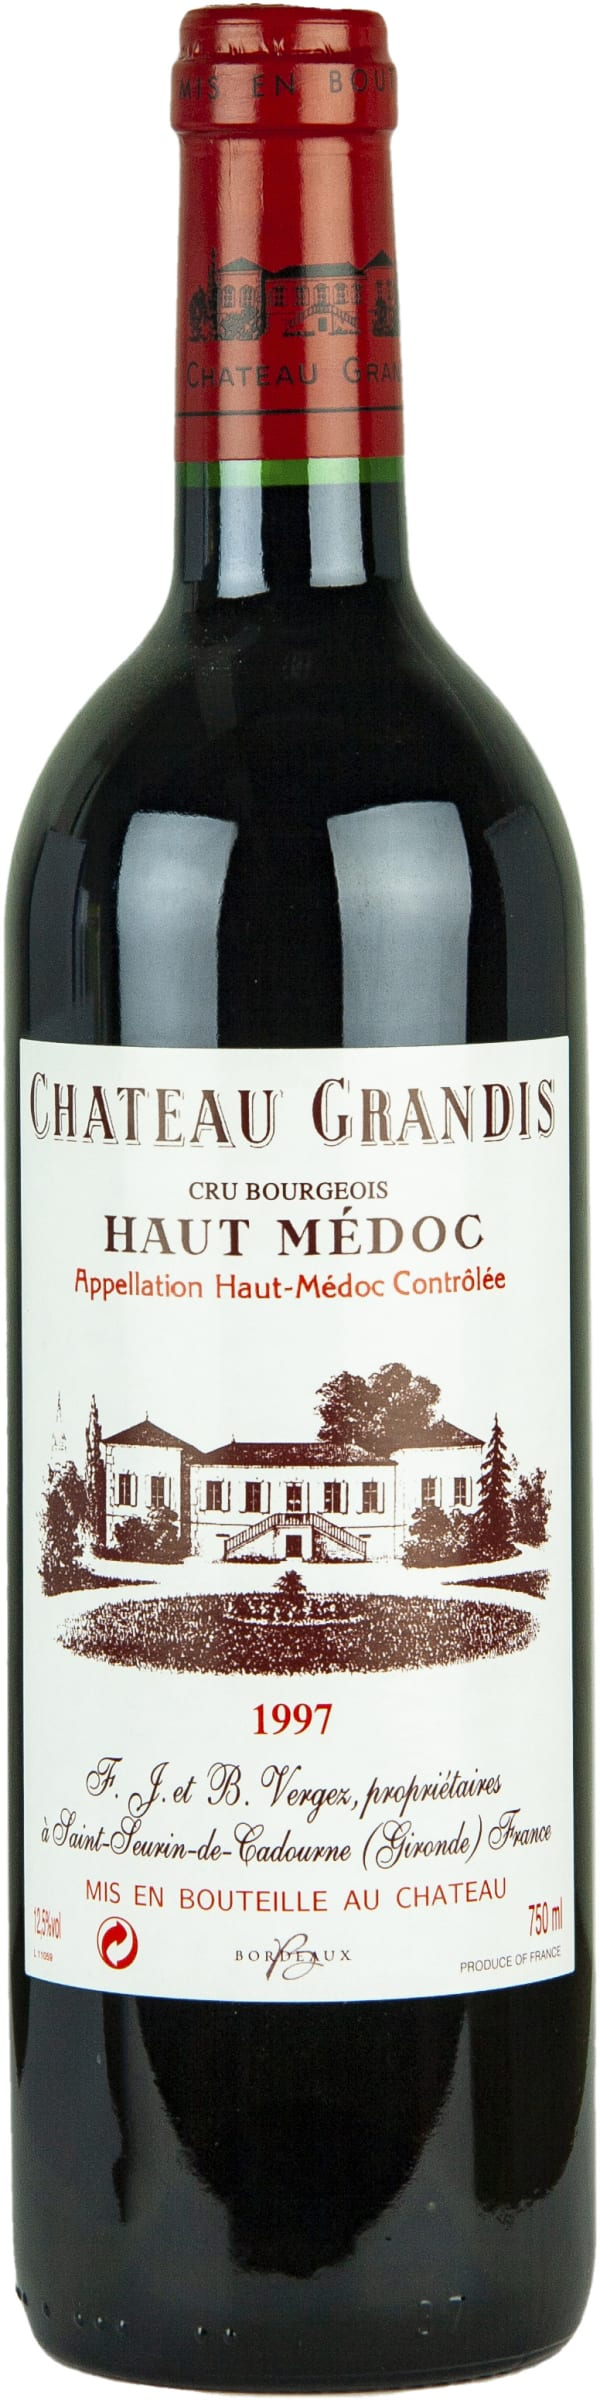 Château Grandis 1997